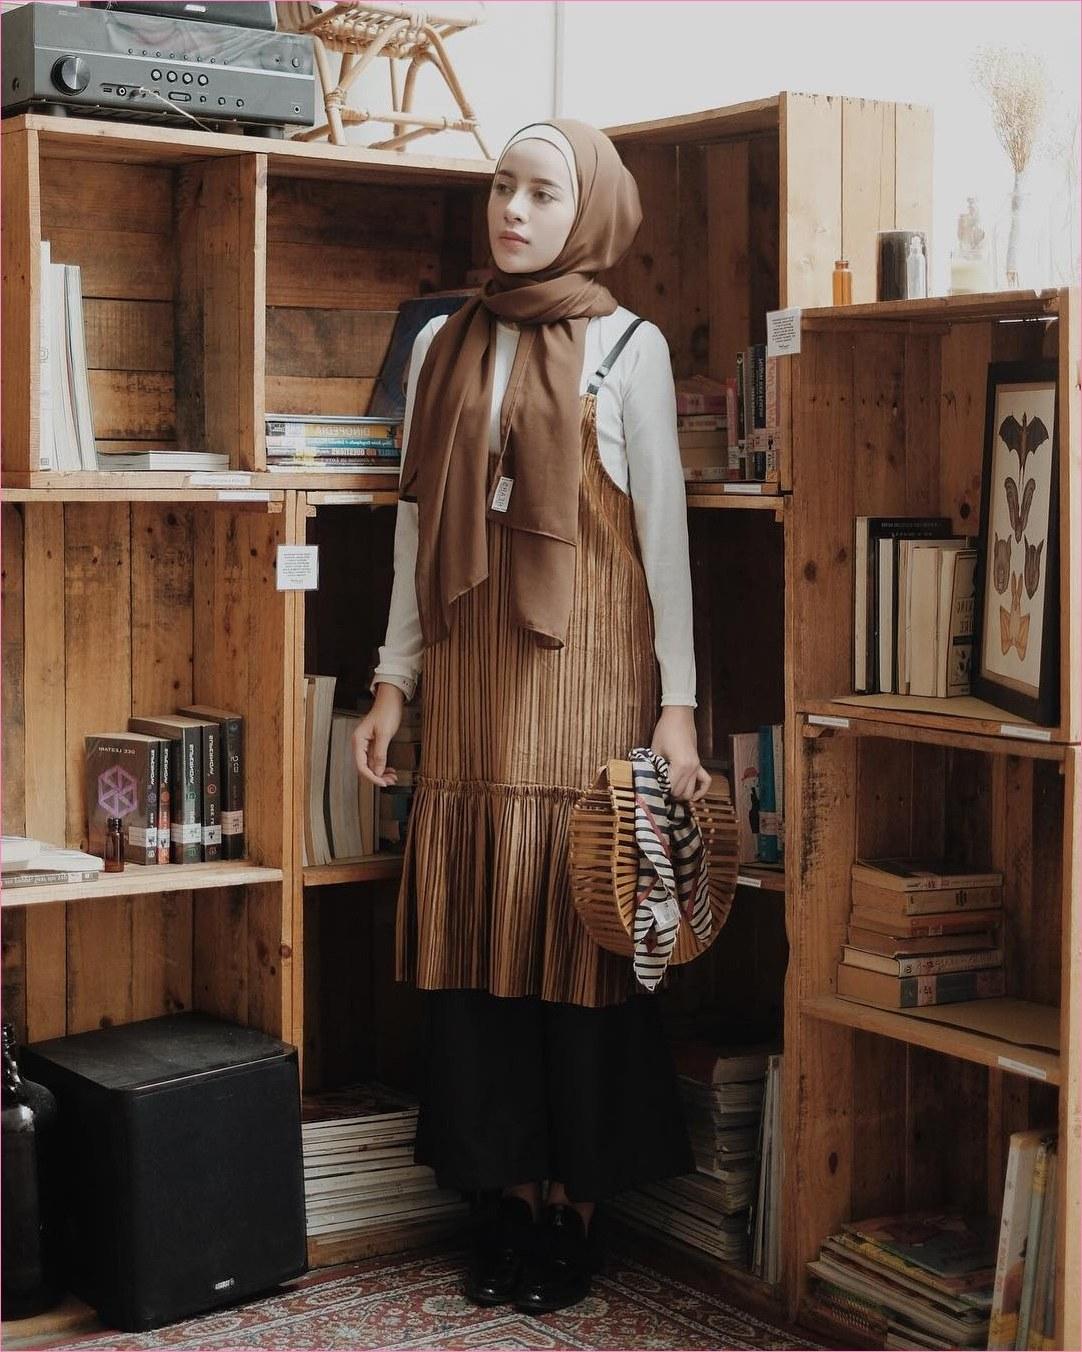 Design Model Baju Lebaran Syar'i 2019 Mndw 80 Model Baju Lebaran Terbaru 2019 Muslimah Trendy Model